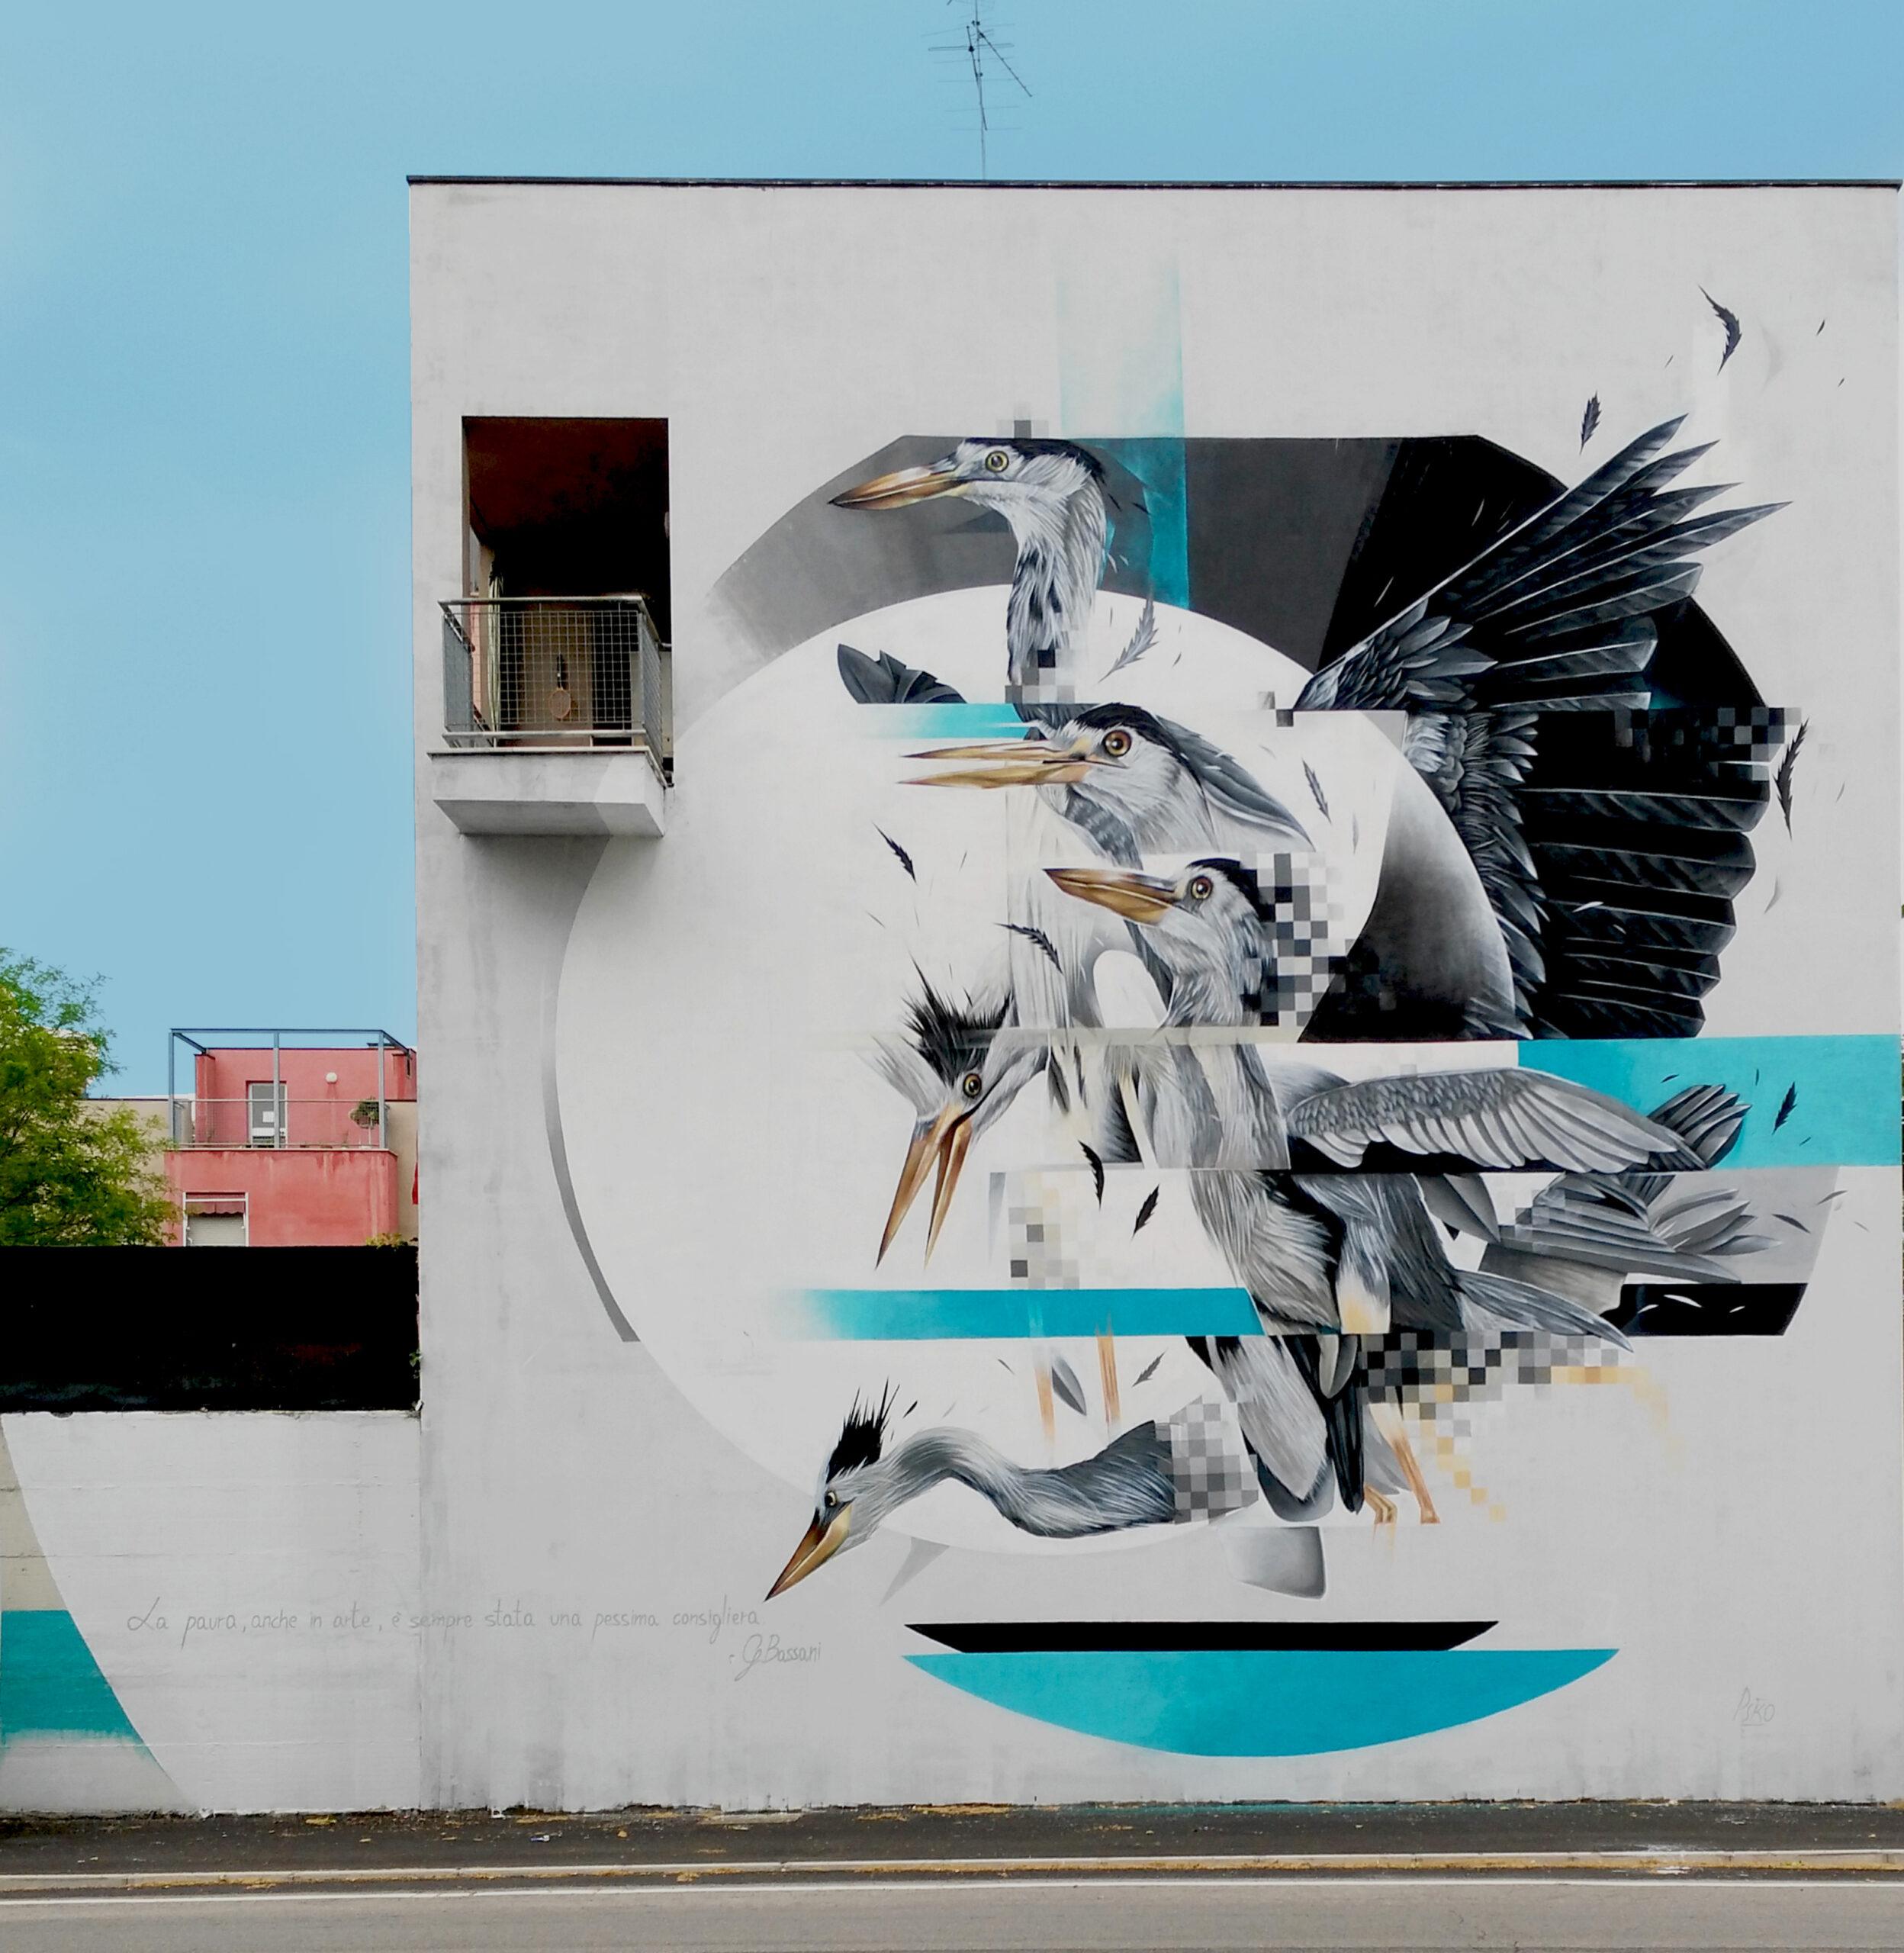 Psiko, Grey heron, Ferrara, Via Rino Maragno, 2017. Photo credits l'artista